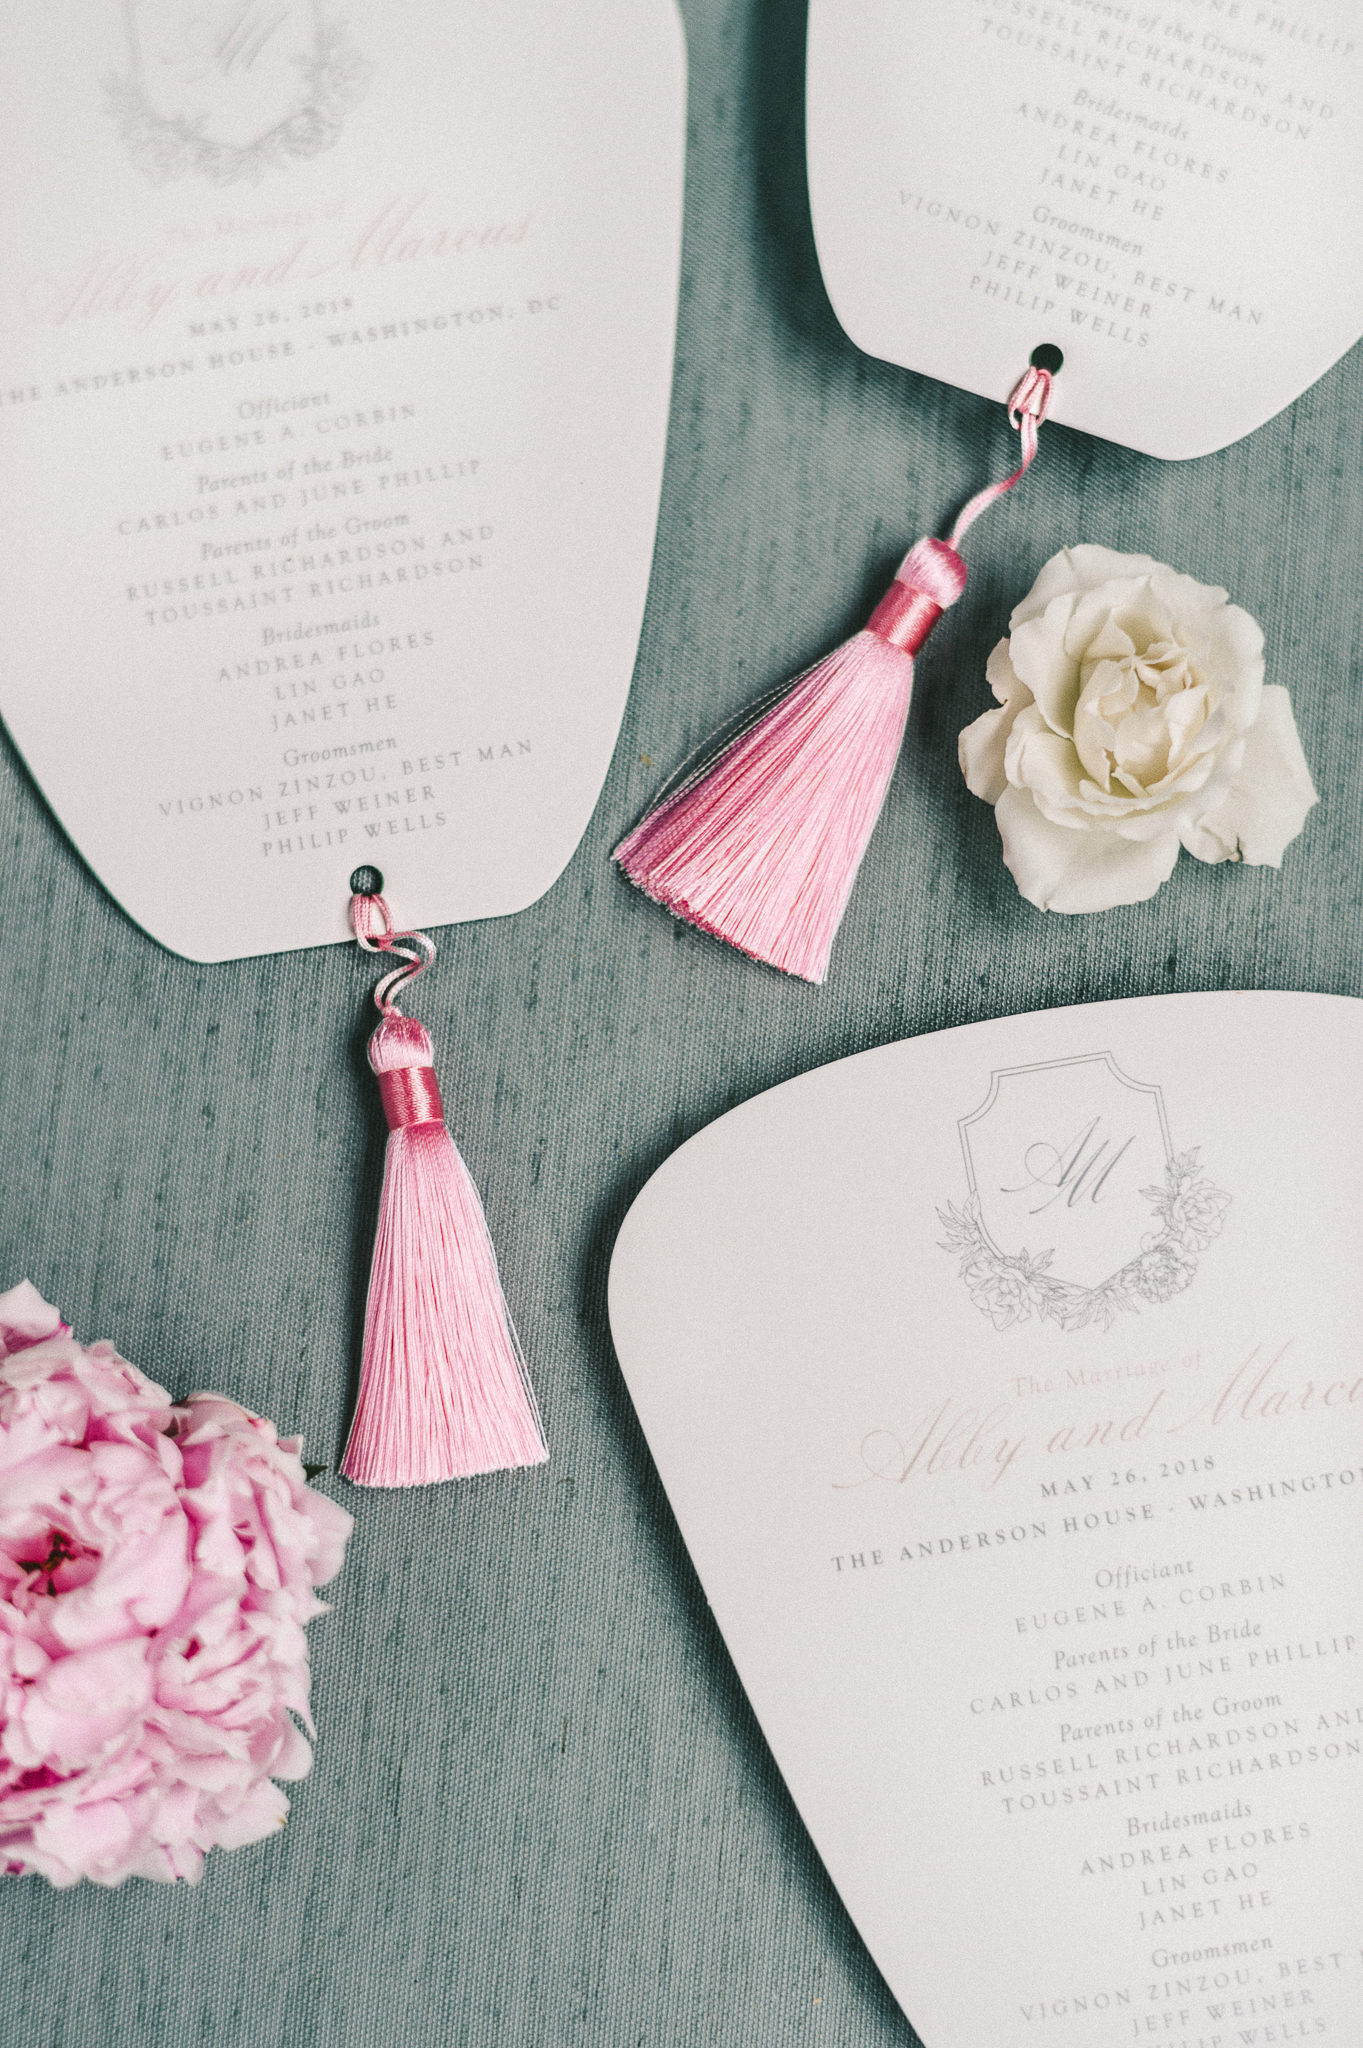 abby marcus wedding programs 29